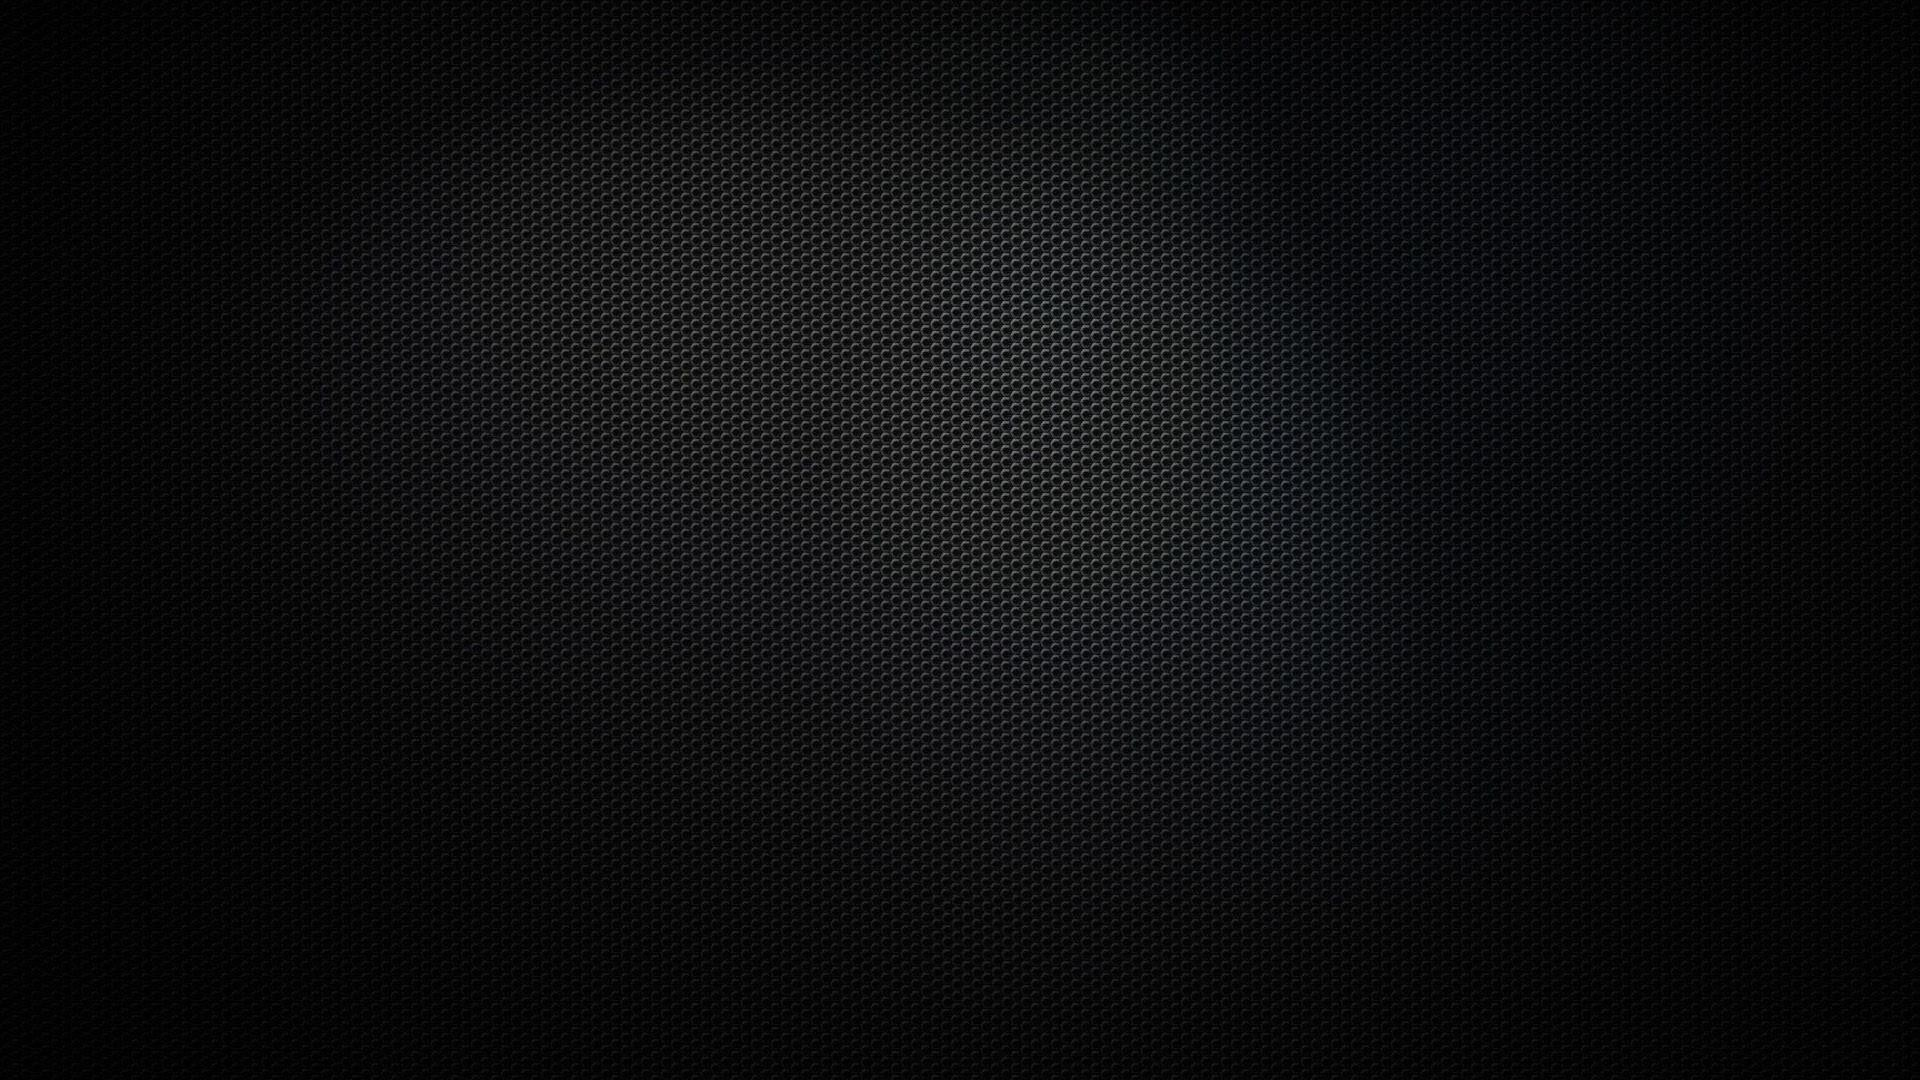 Black Hd Wallpaper 11 Hd Wallpaper